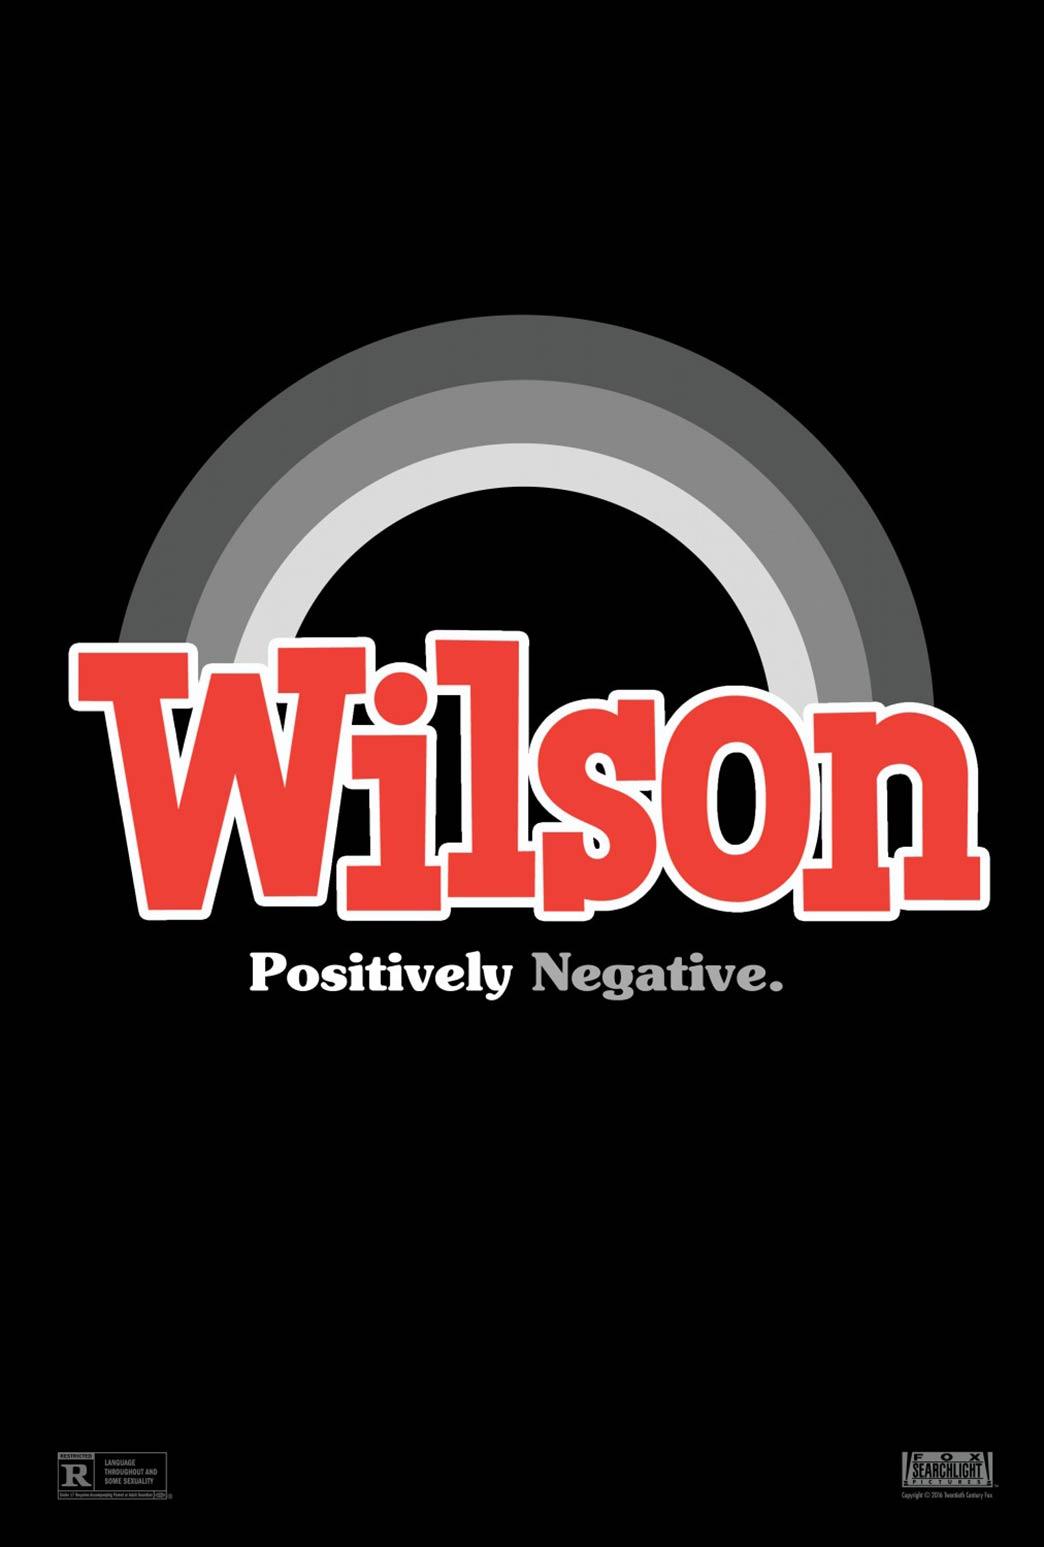 Wilson Poster #1